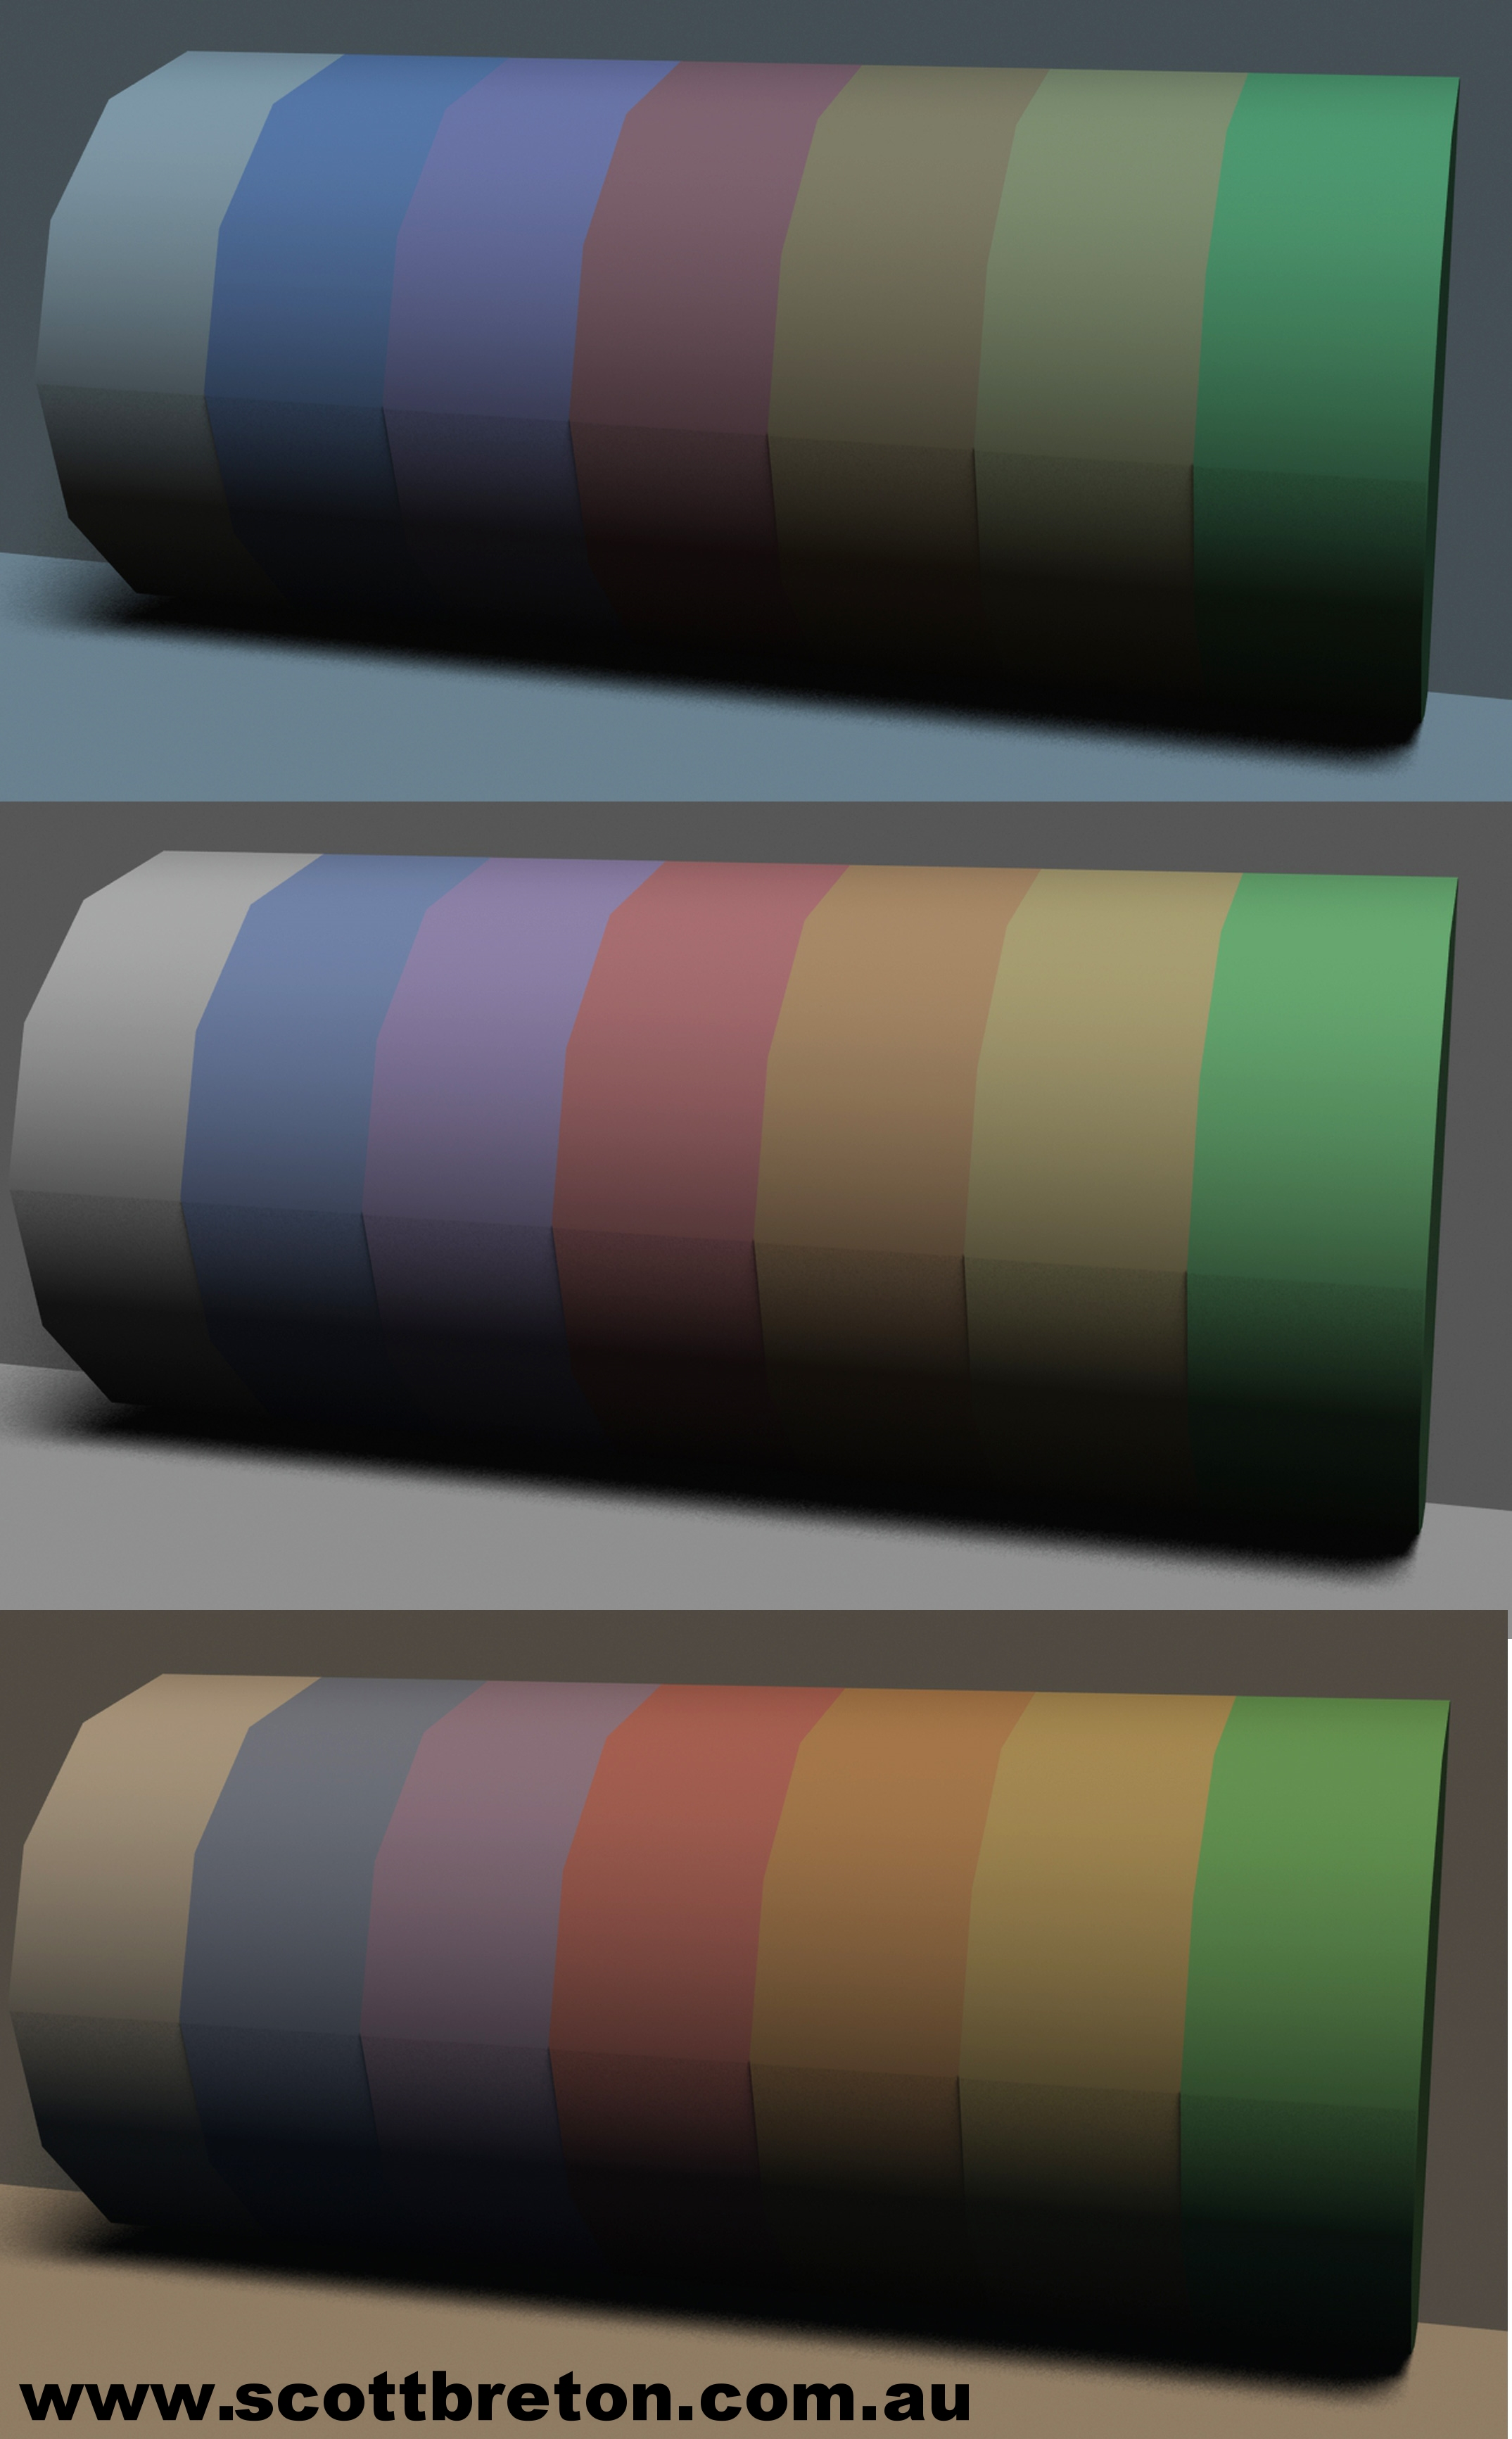 Diagram 6: Same object, light varies